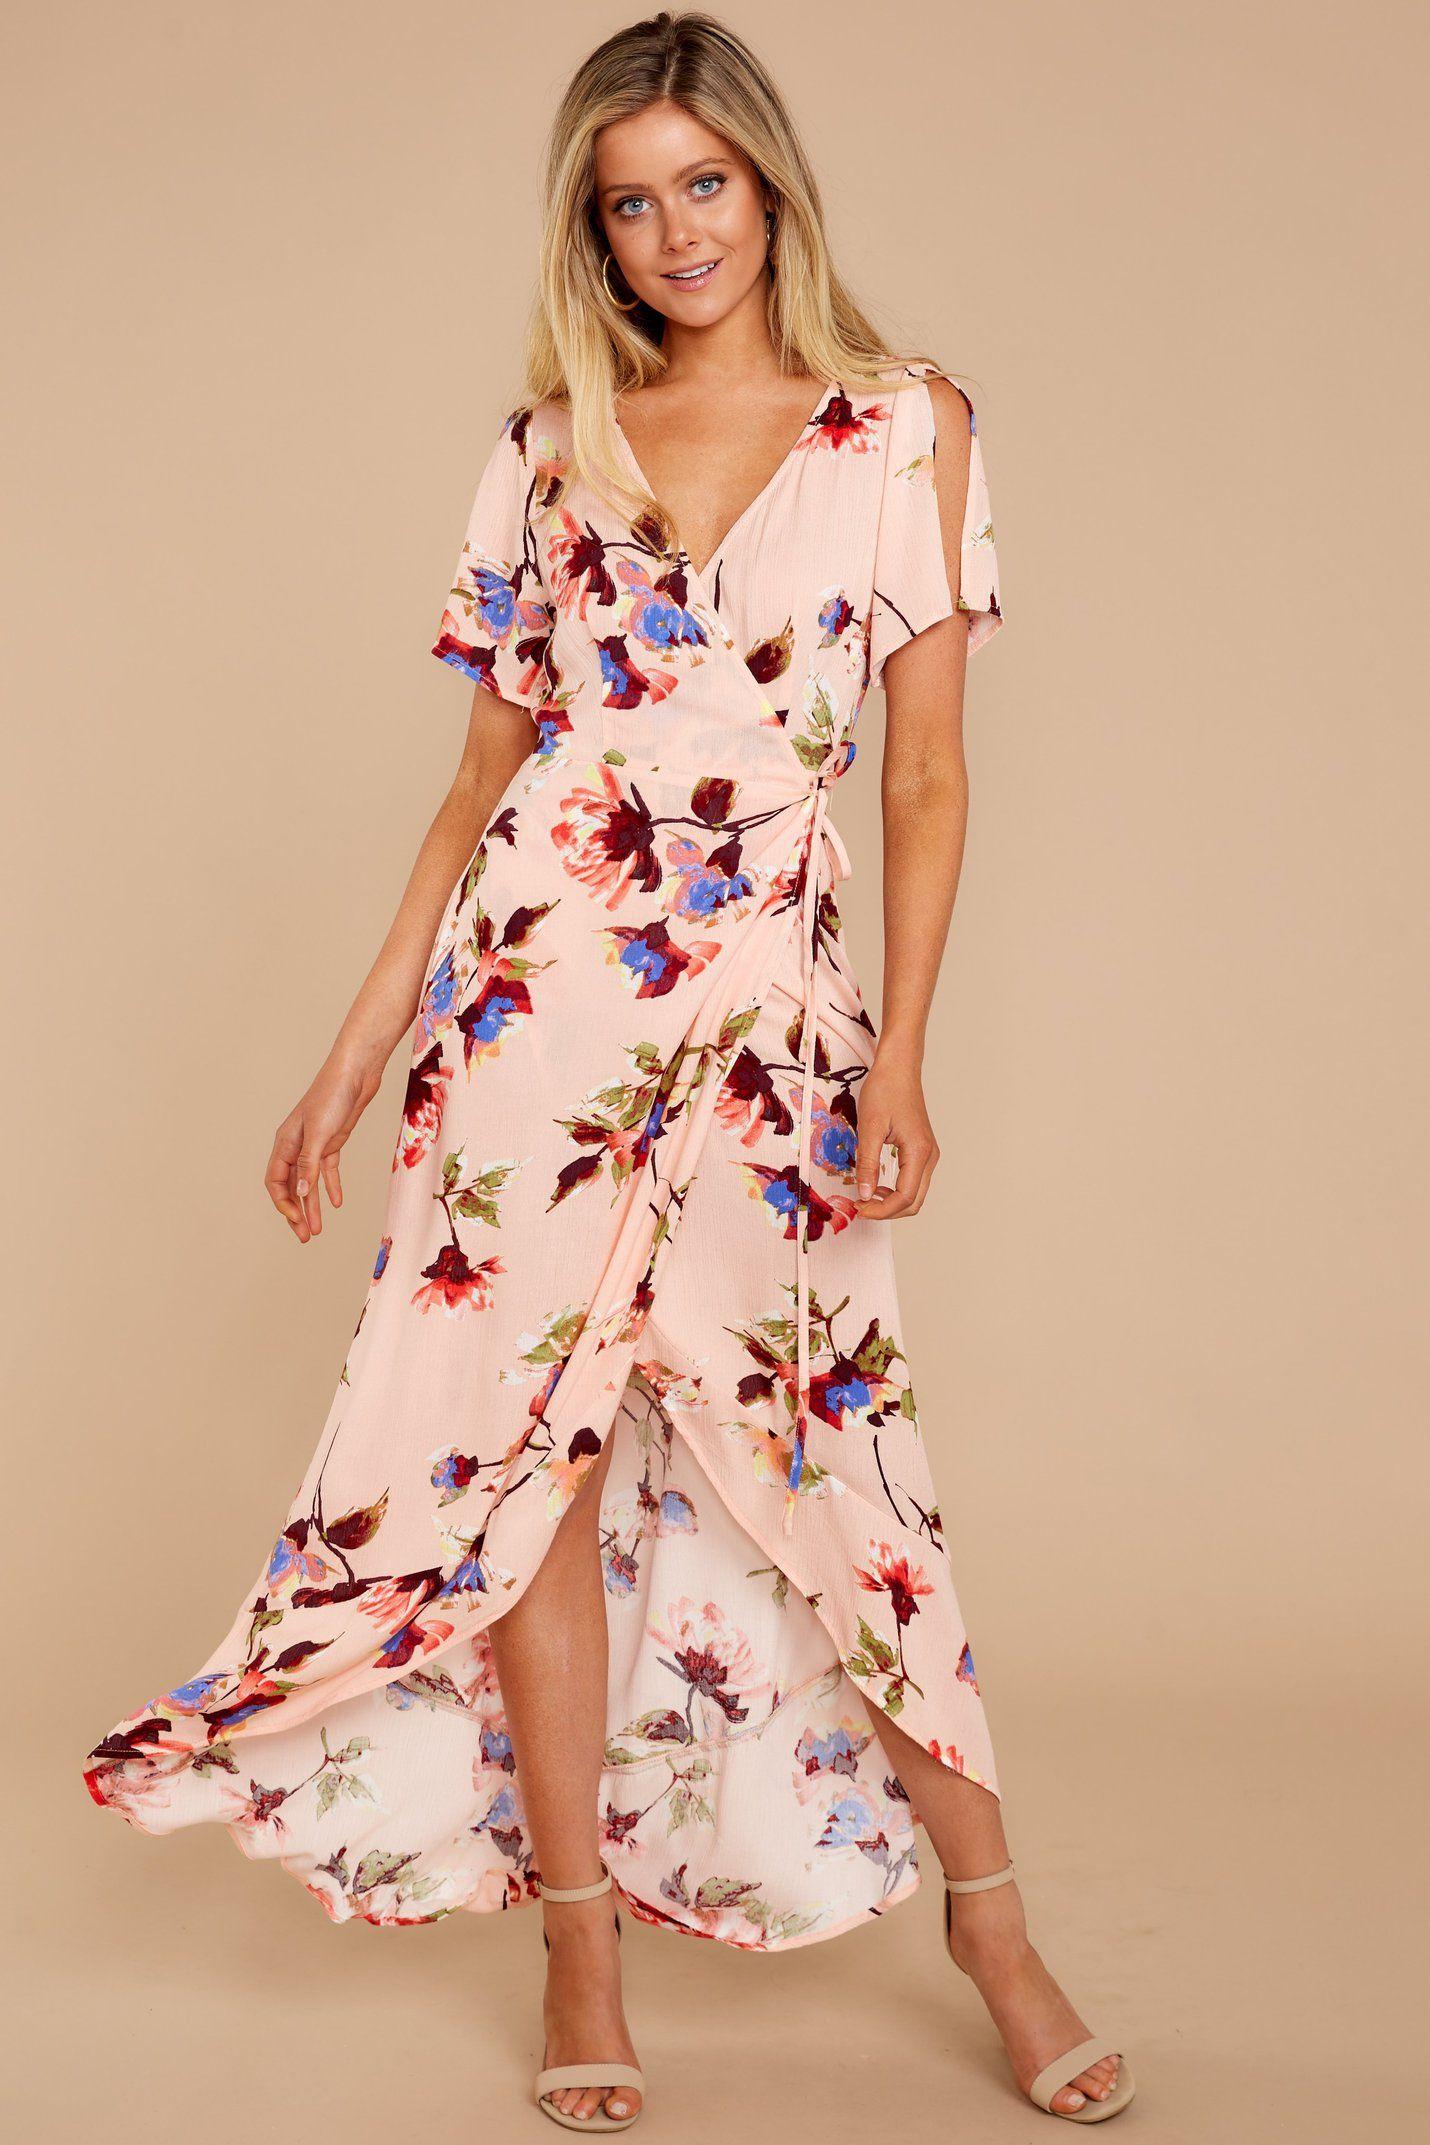 40 Cute Summer Sundresses Under 100 Pearls Prada Trendy Maxi Dresses Summer Dresses Sundresses Dainty Dress [ 2145 x 1430 Pixel ]